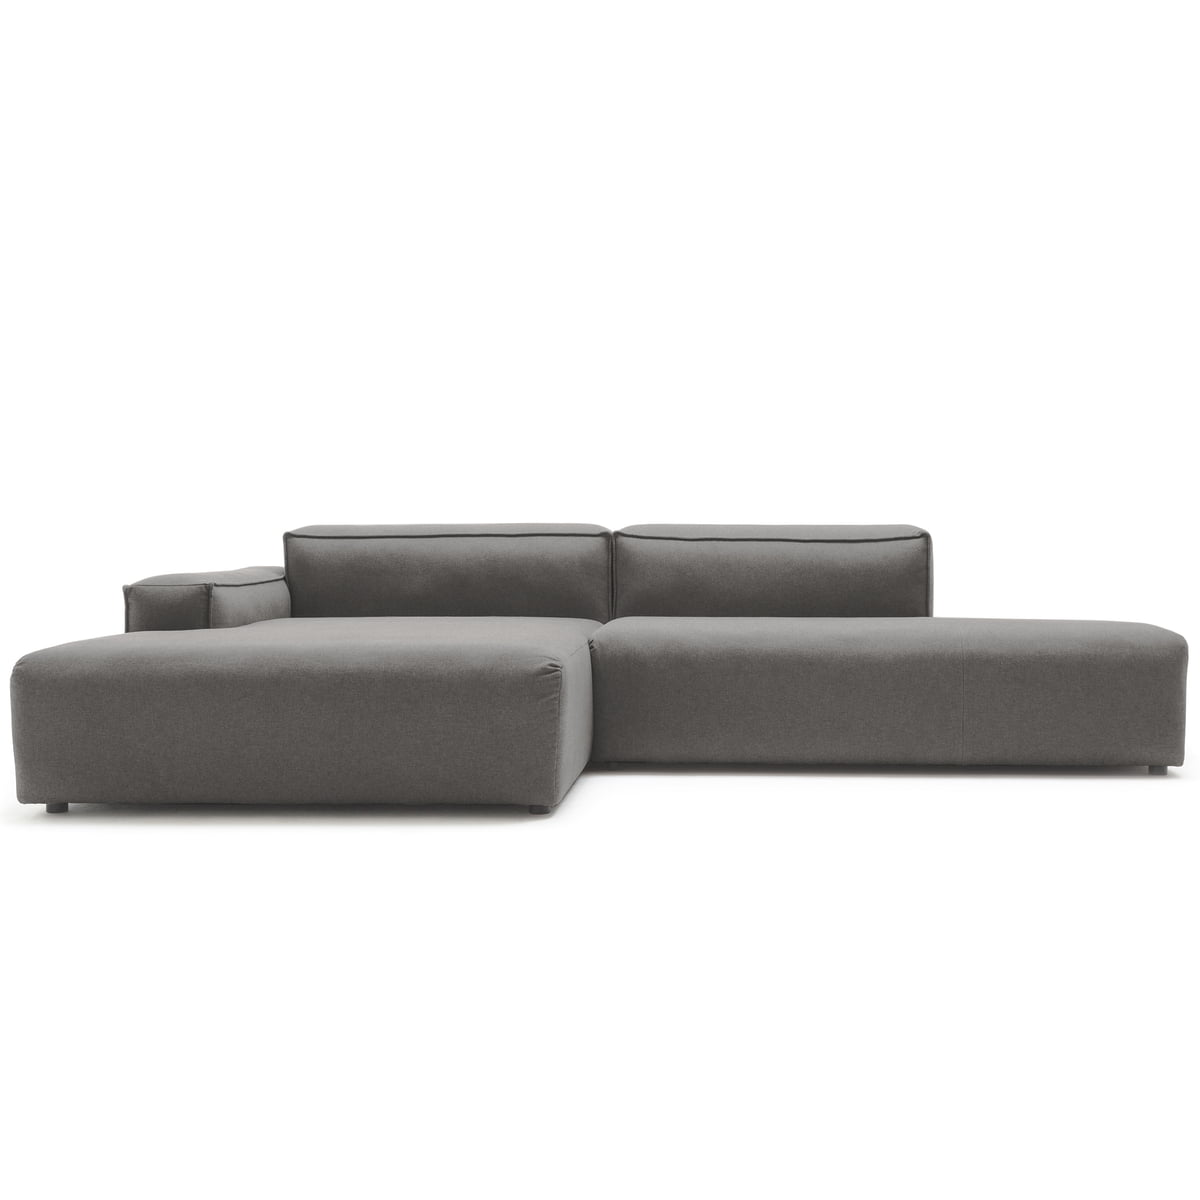 Rolf Benz Sofa Freistil Modern Home Interior Ideas